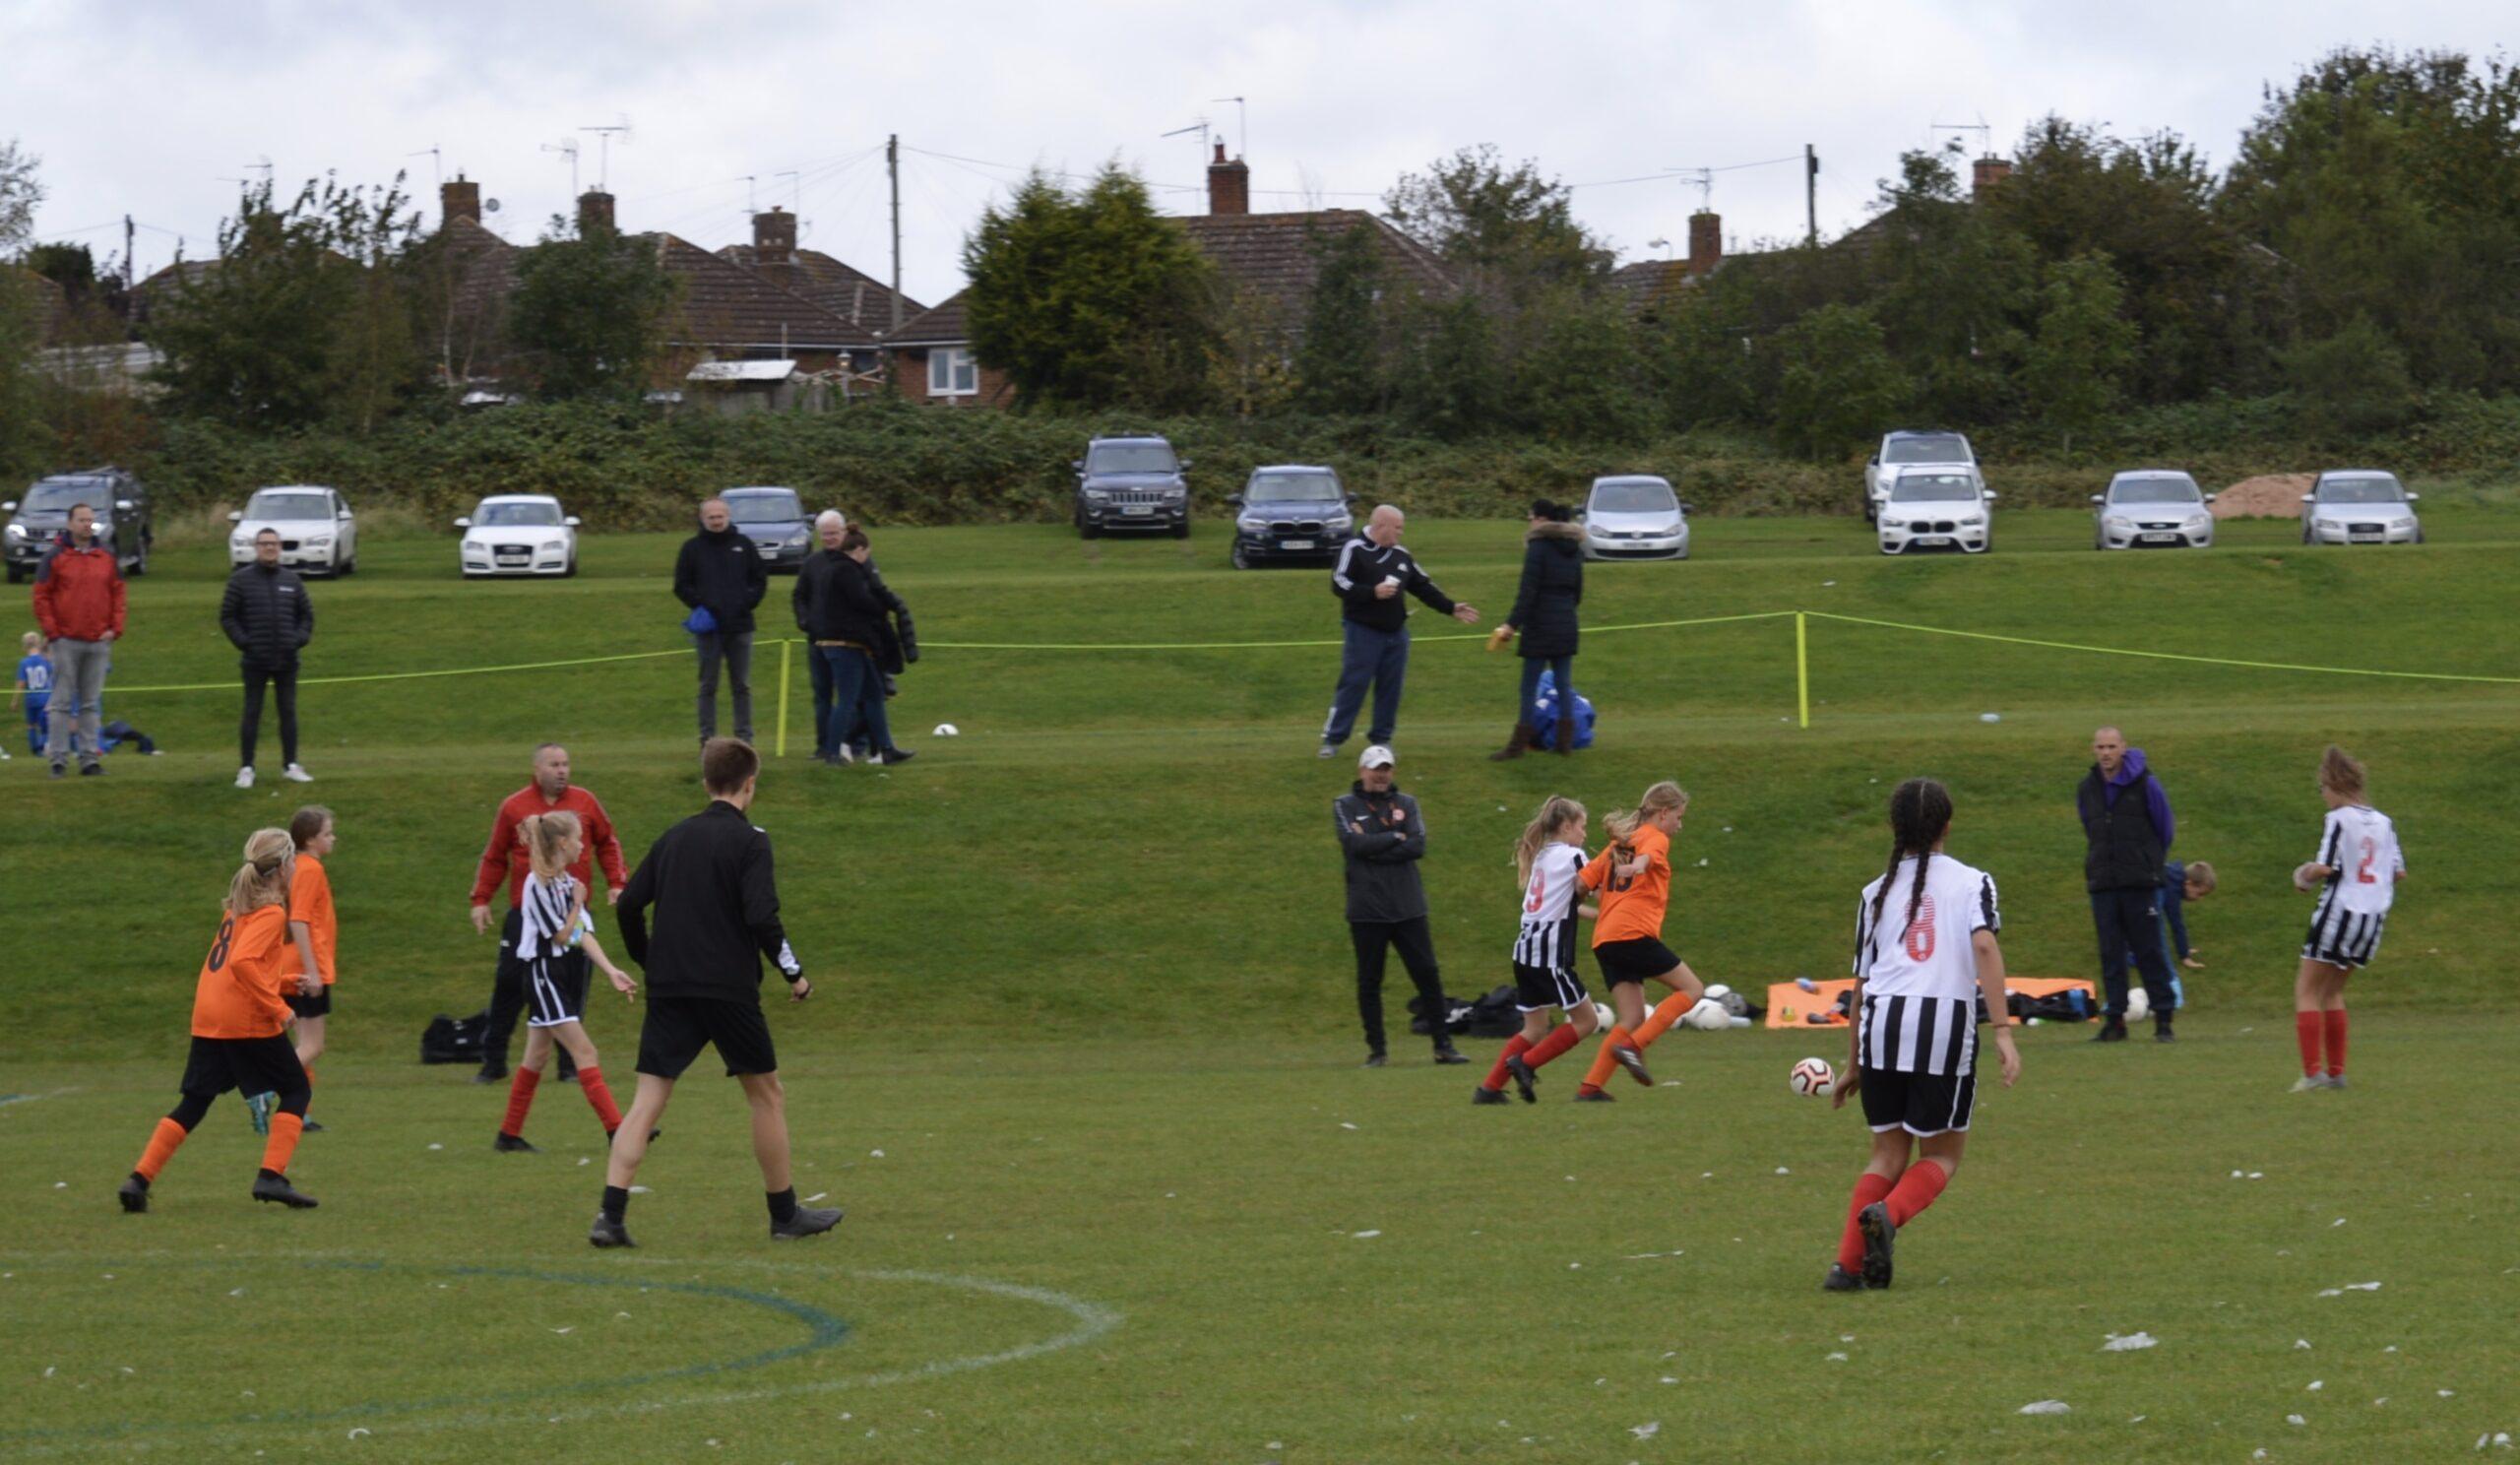 Rugby Borough Girls U12s v Coalville Town Girls U12s Match Photo